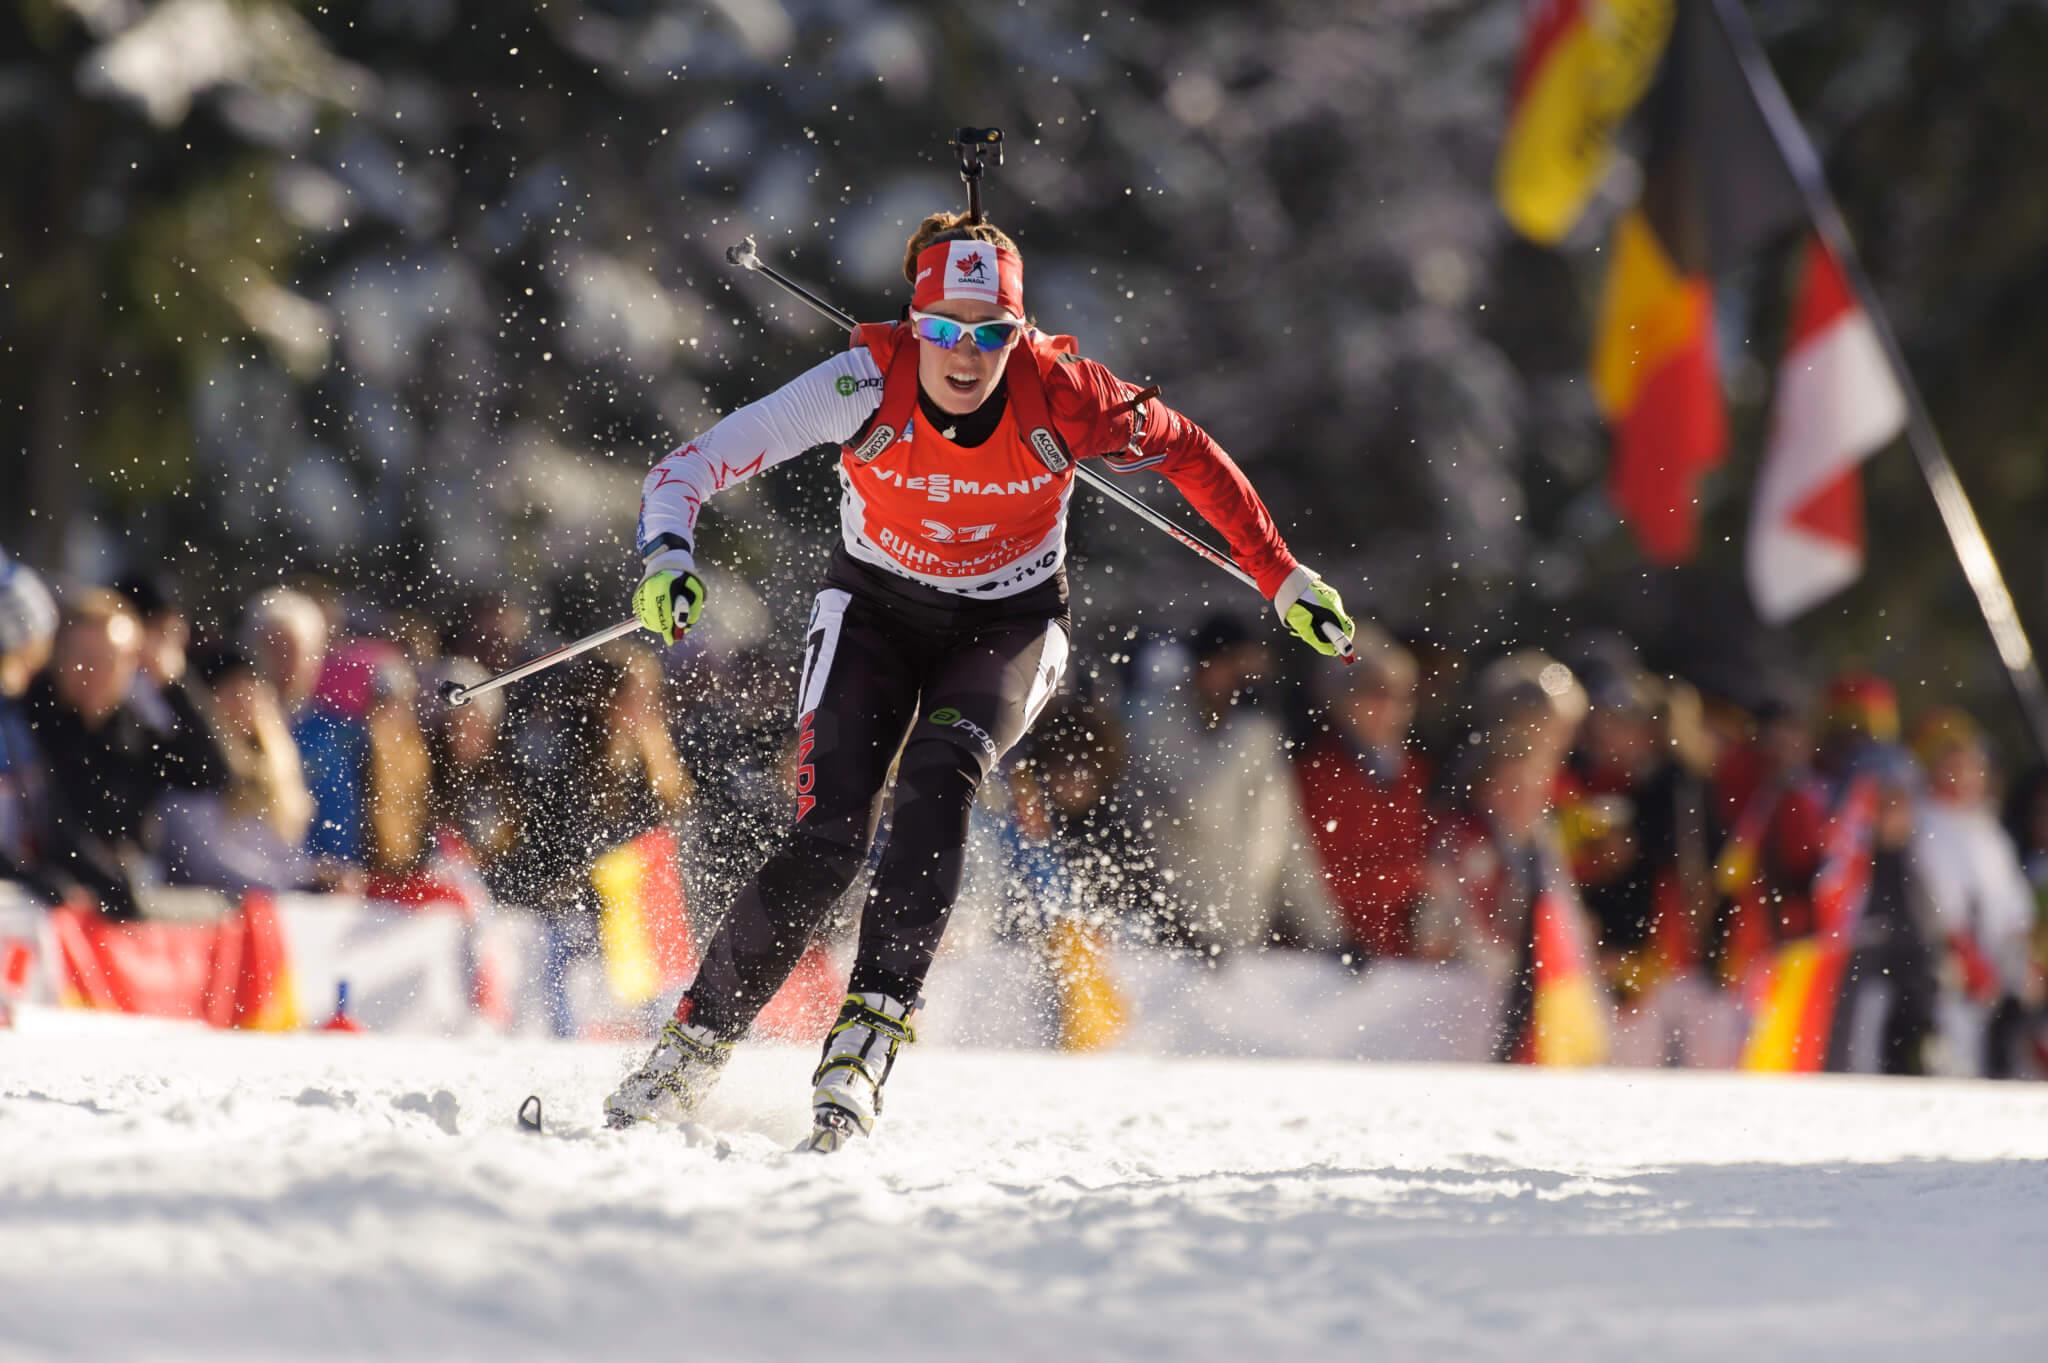 "Gabriela Soukalova CZE Biathlon Welt Cup in Hochfilzen, Oesterreich am 11.12.2014 Copyright by ROLF KOSECKI - ""An Tiebes Eiche 22 - 53229 Bonn - Tel:0228 977 540 - Mobil:0171 220 7798 - Fax:0228 977 5419 - Konto: Deutsche Bank Bonn - IBAN: DE94380700240095137600 - BIC: DEUTDEDB380"""